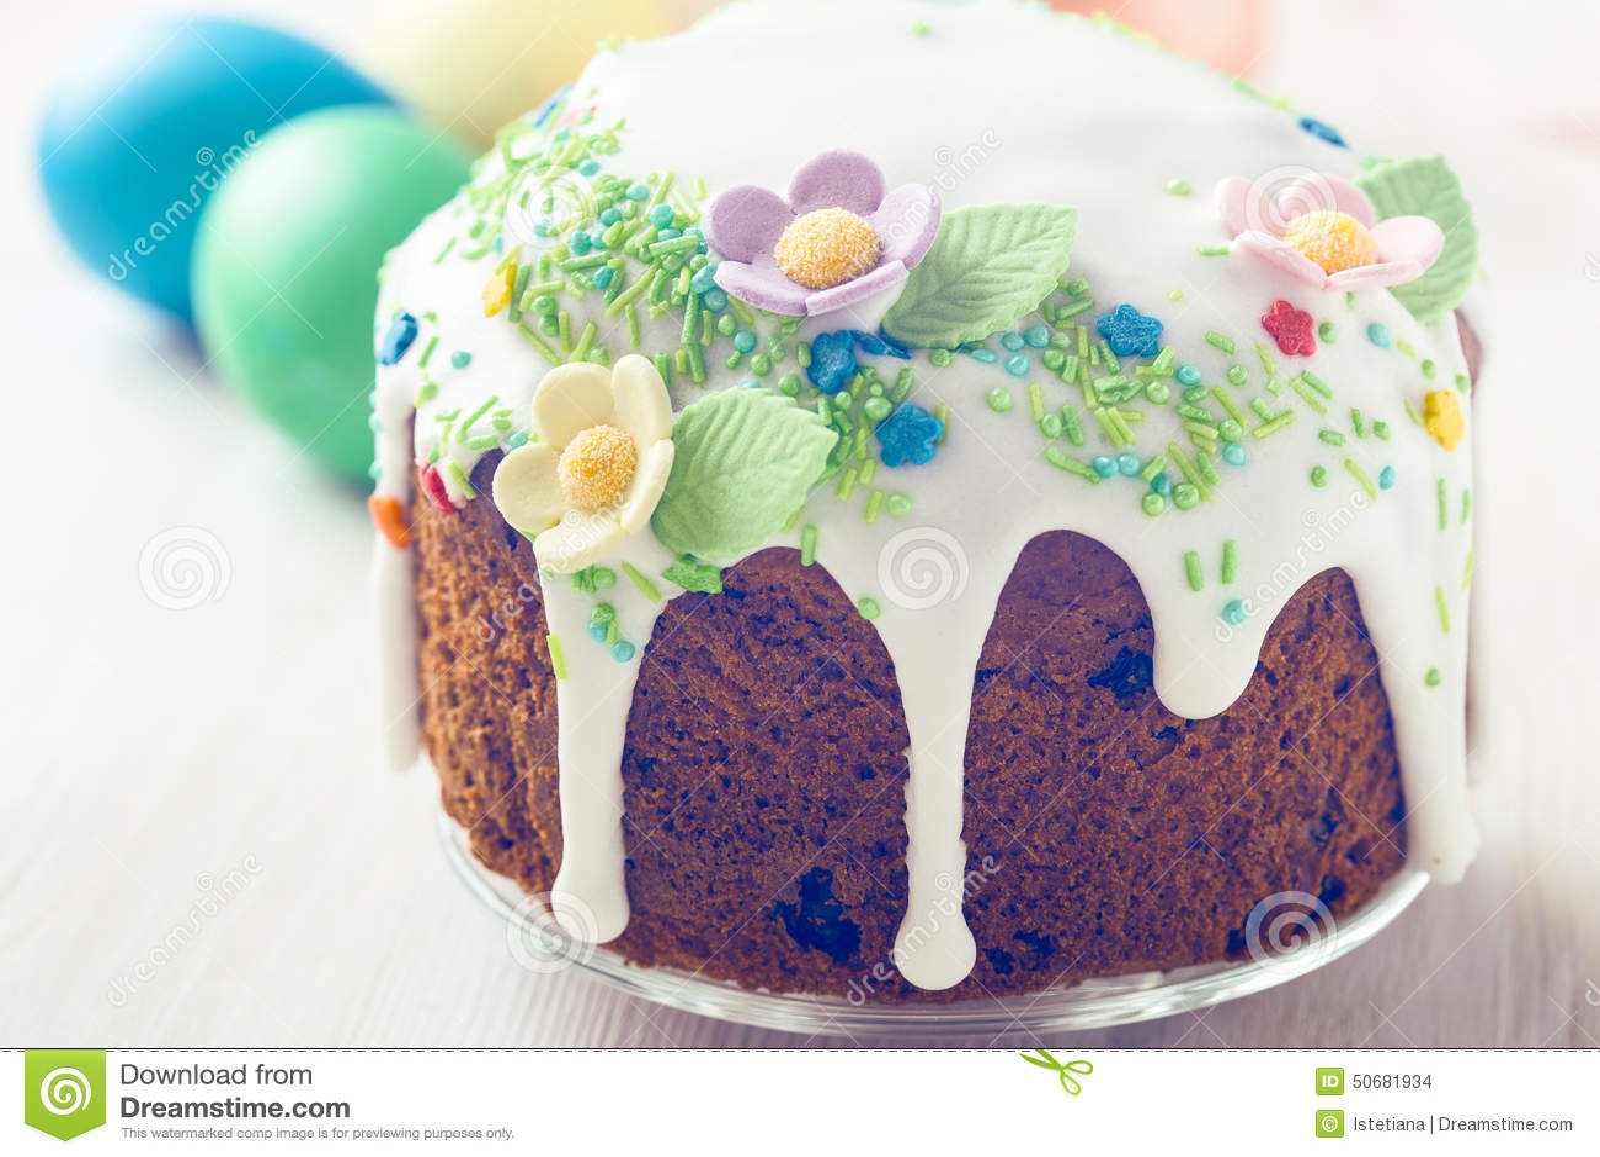 Download 俄国人与糖渍的结冰和装饰的复活节蛋糕 库存照片. 图片 包括有 蛋糕, 混合药剂, 欢乐, bacterias - 50681934